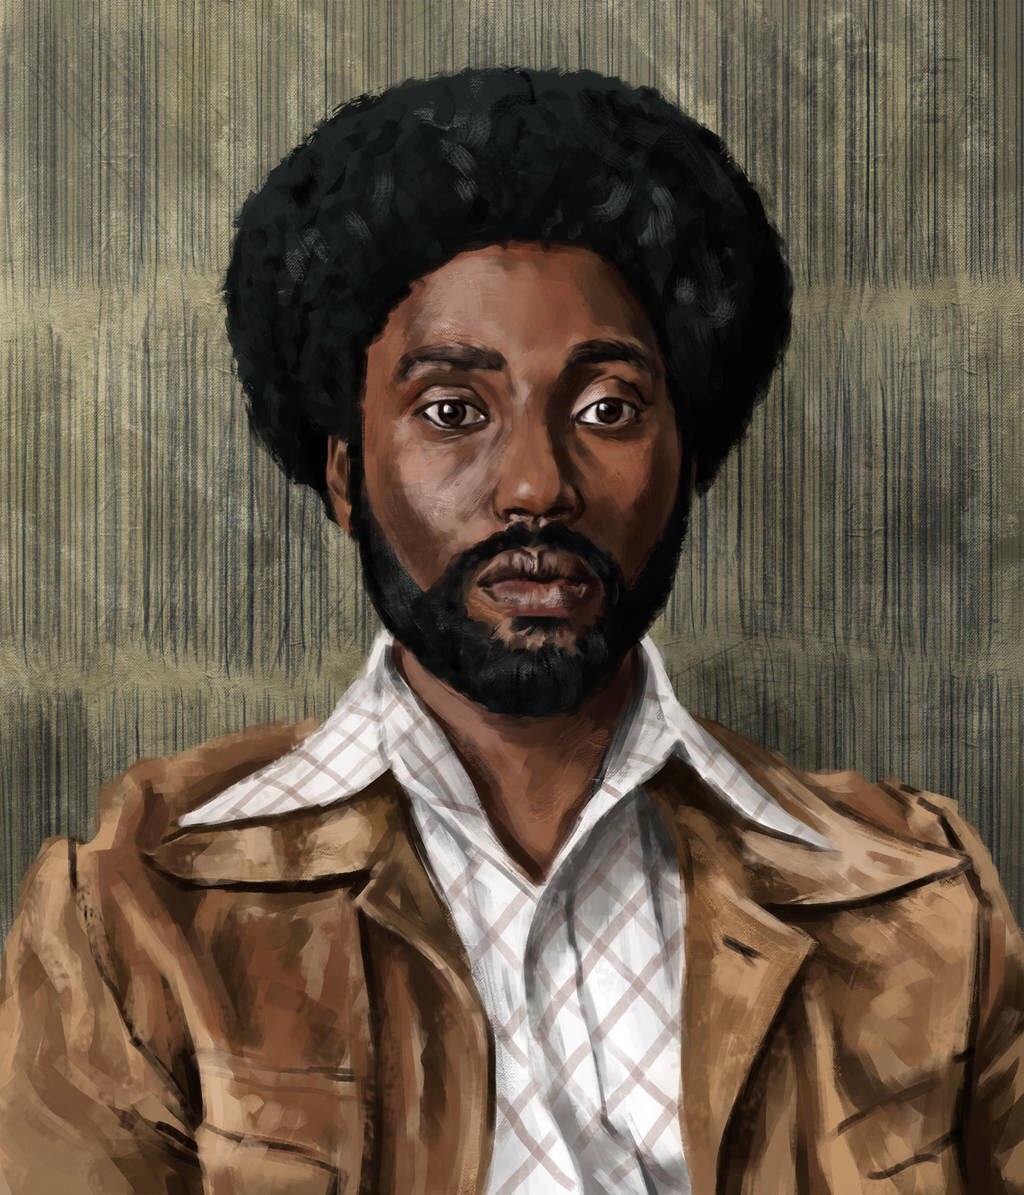 Let's kick off our #OscarSeason with this spectacular portrait of Ron Stallworth (John David Washington) from @BlacKkKlansman by artist @CalebAlonzo   Check out Calebs work here:  https://www. deviantart.com/calebalonzosmi th &nbsp; …   #WeDigOscars<br>http://pic.twitter.com/NH5Q06dLdP